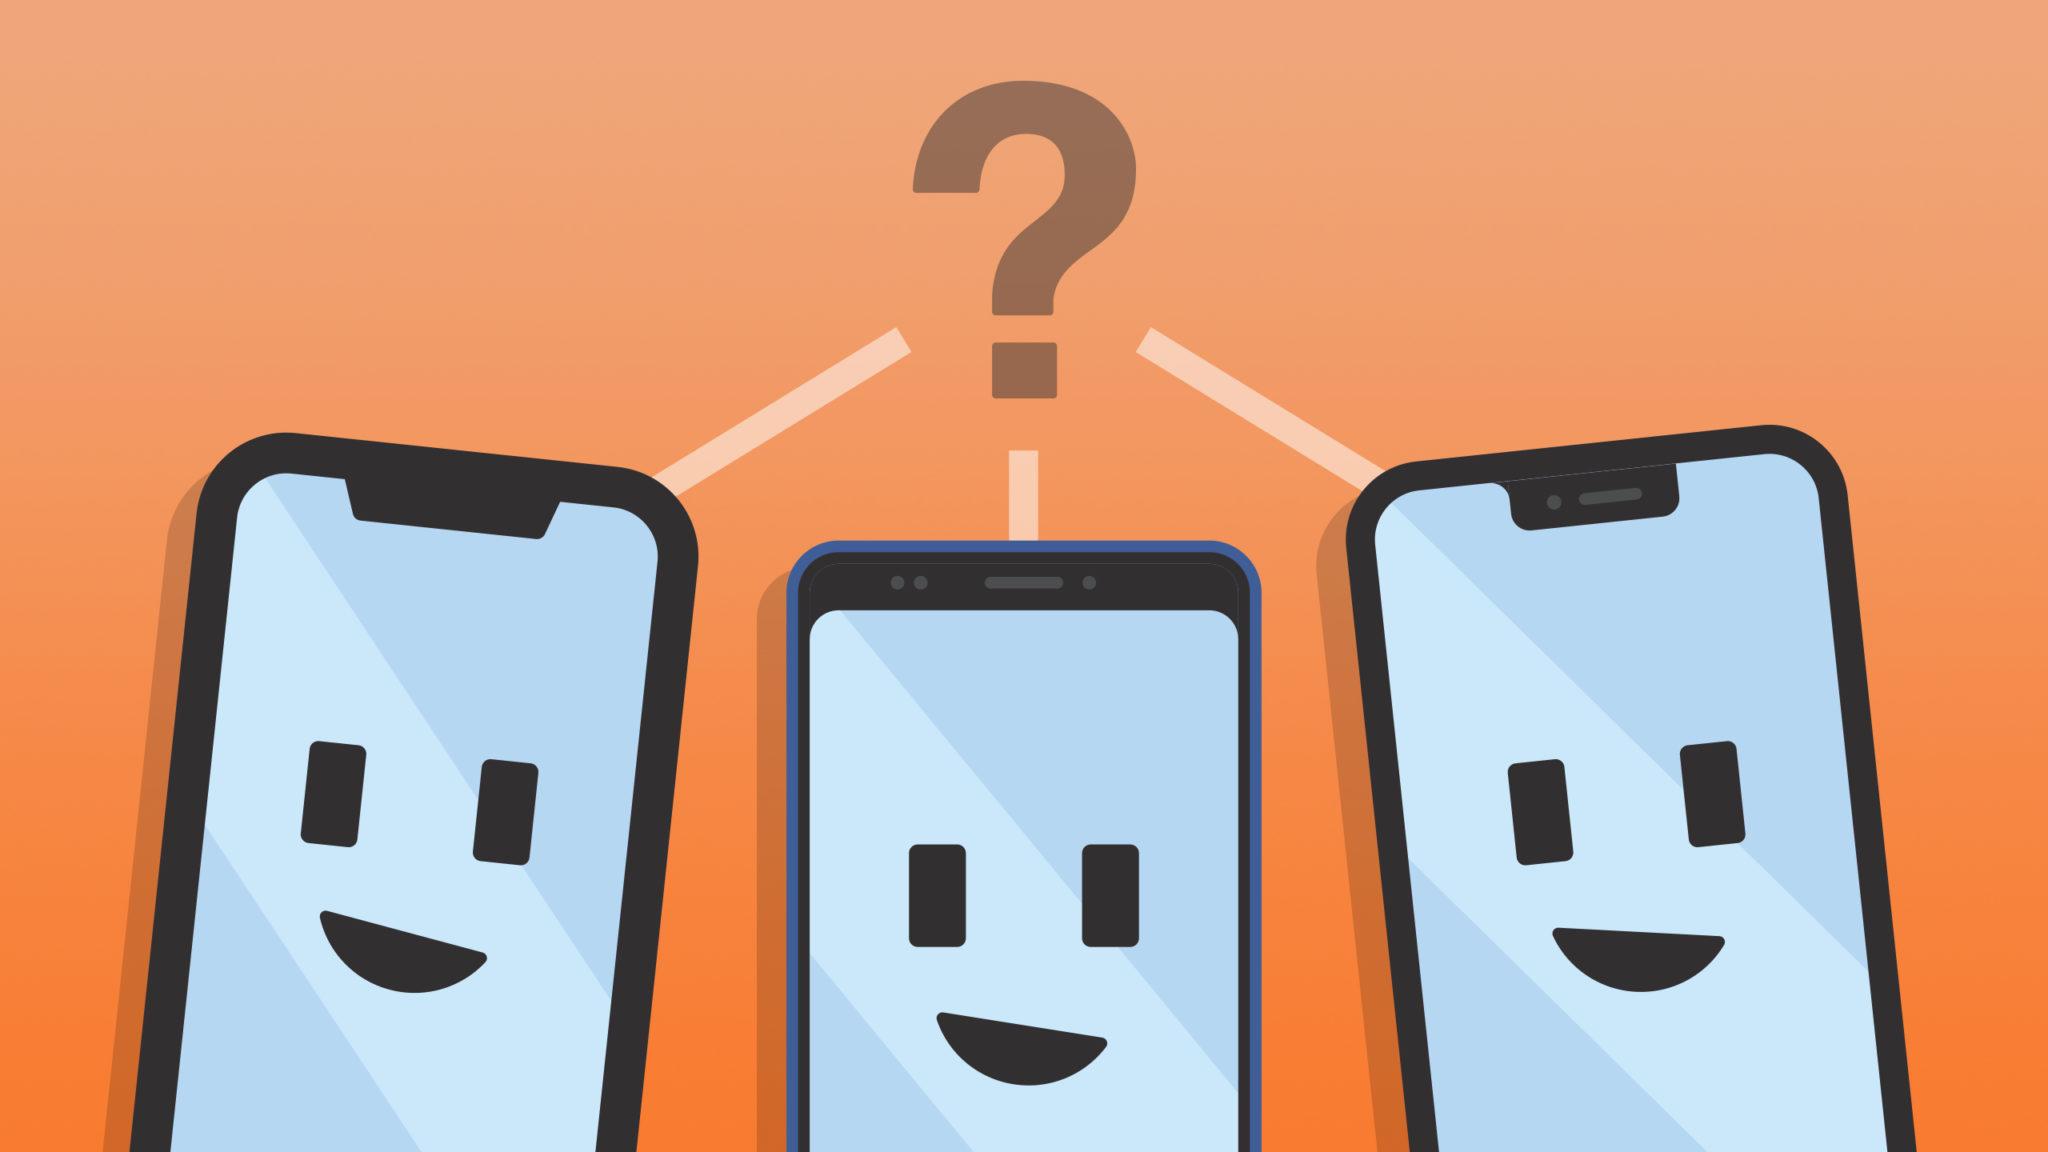 iPhone vs Android: ¿Cuál es mejor en April 2021?